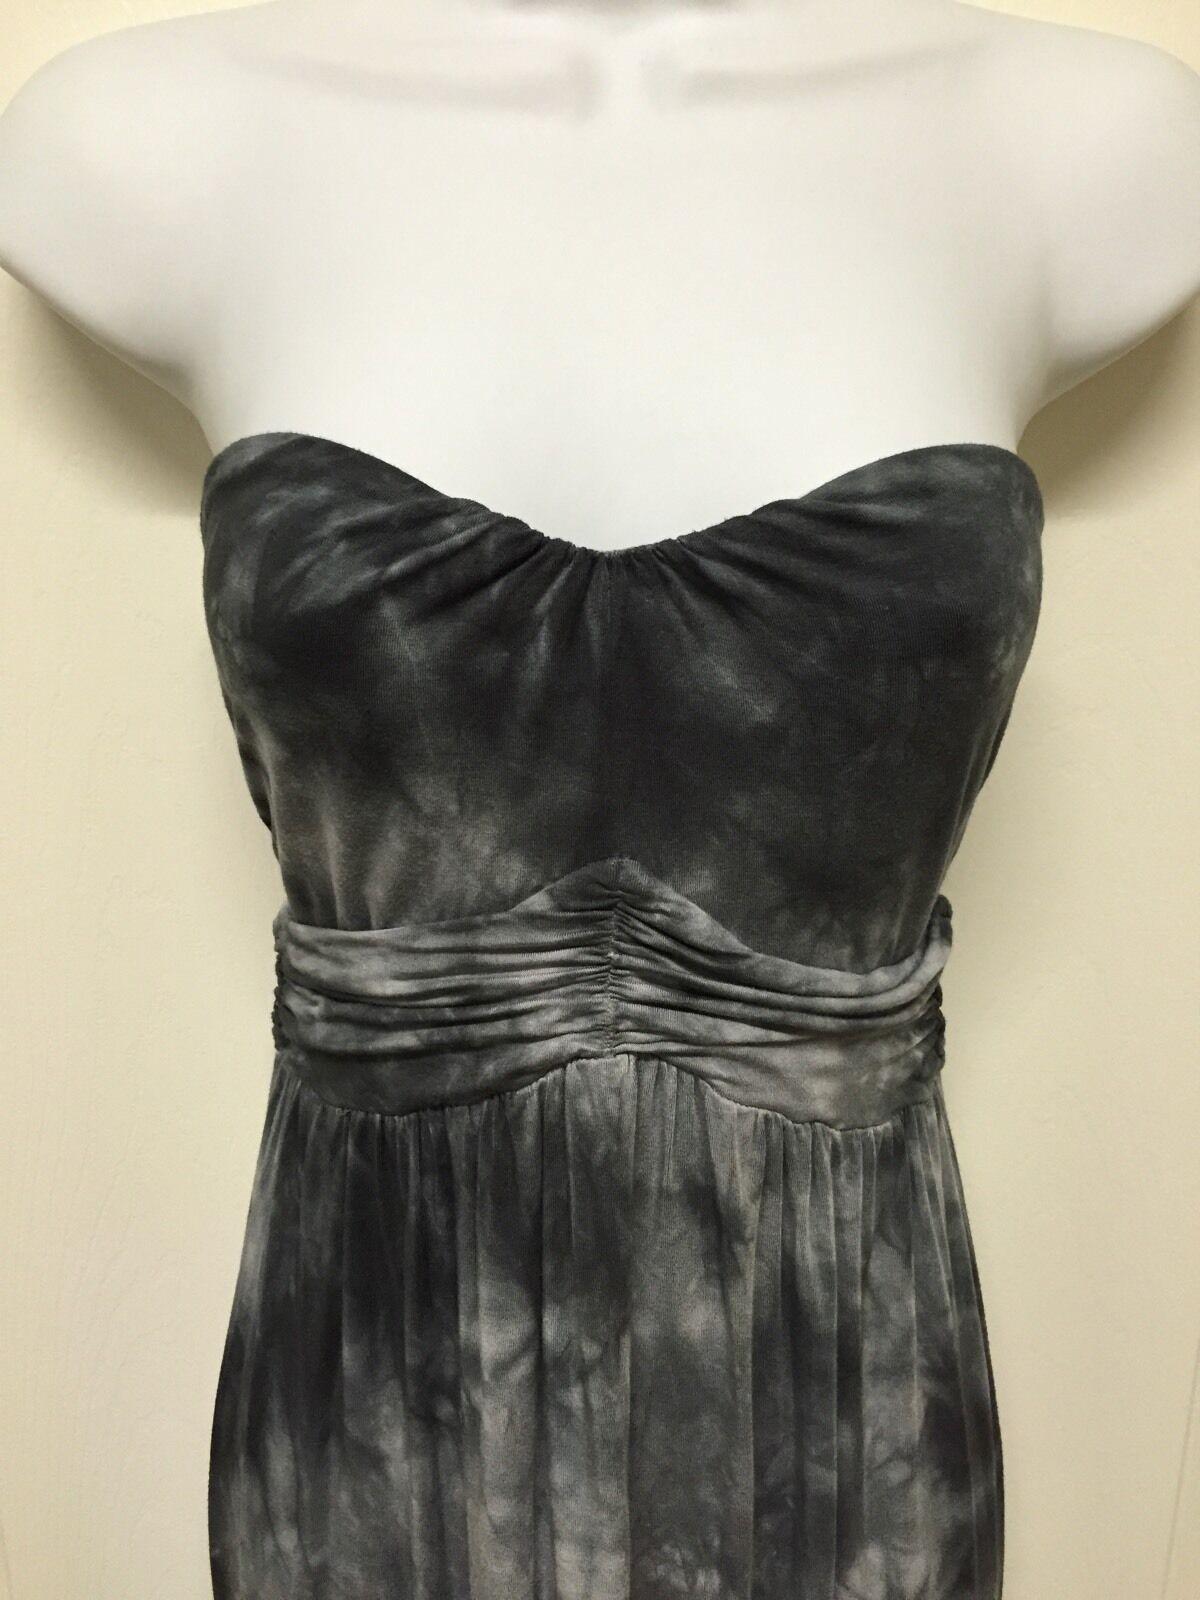 NWT Young Fabulous & Broke Emese Maxi Maxi Maxi Long Dress S Small Strapless Make An Offer 4c3860